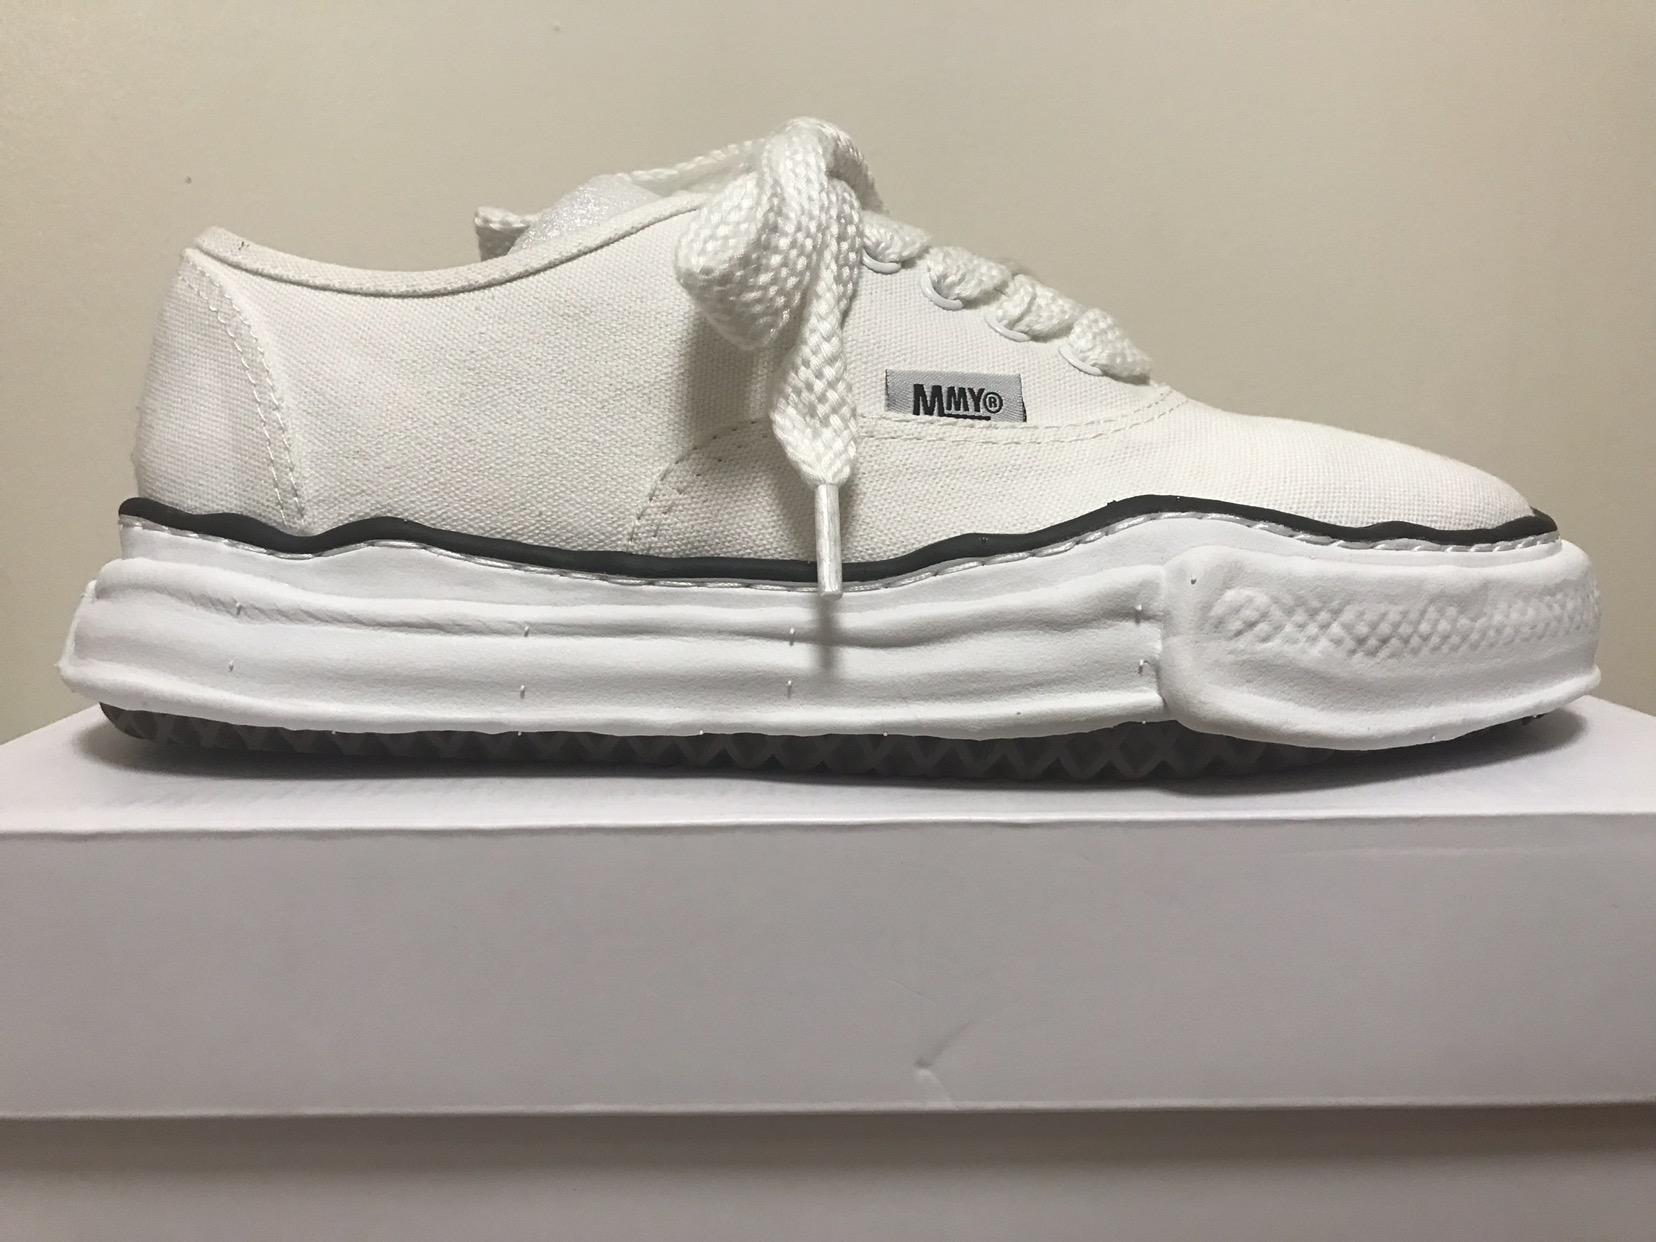 "1d6eb645f70f Miharayasuhiro Maison Mihara Yasuhiro Original Sole ""vans"" in White Size 10  - Low-Top Sneakers for Sale - Grailed"